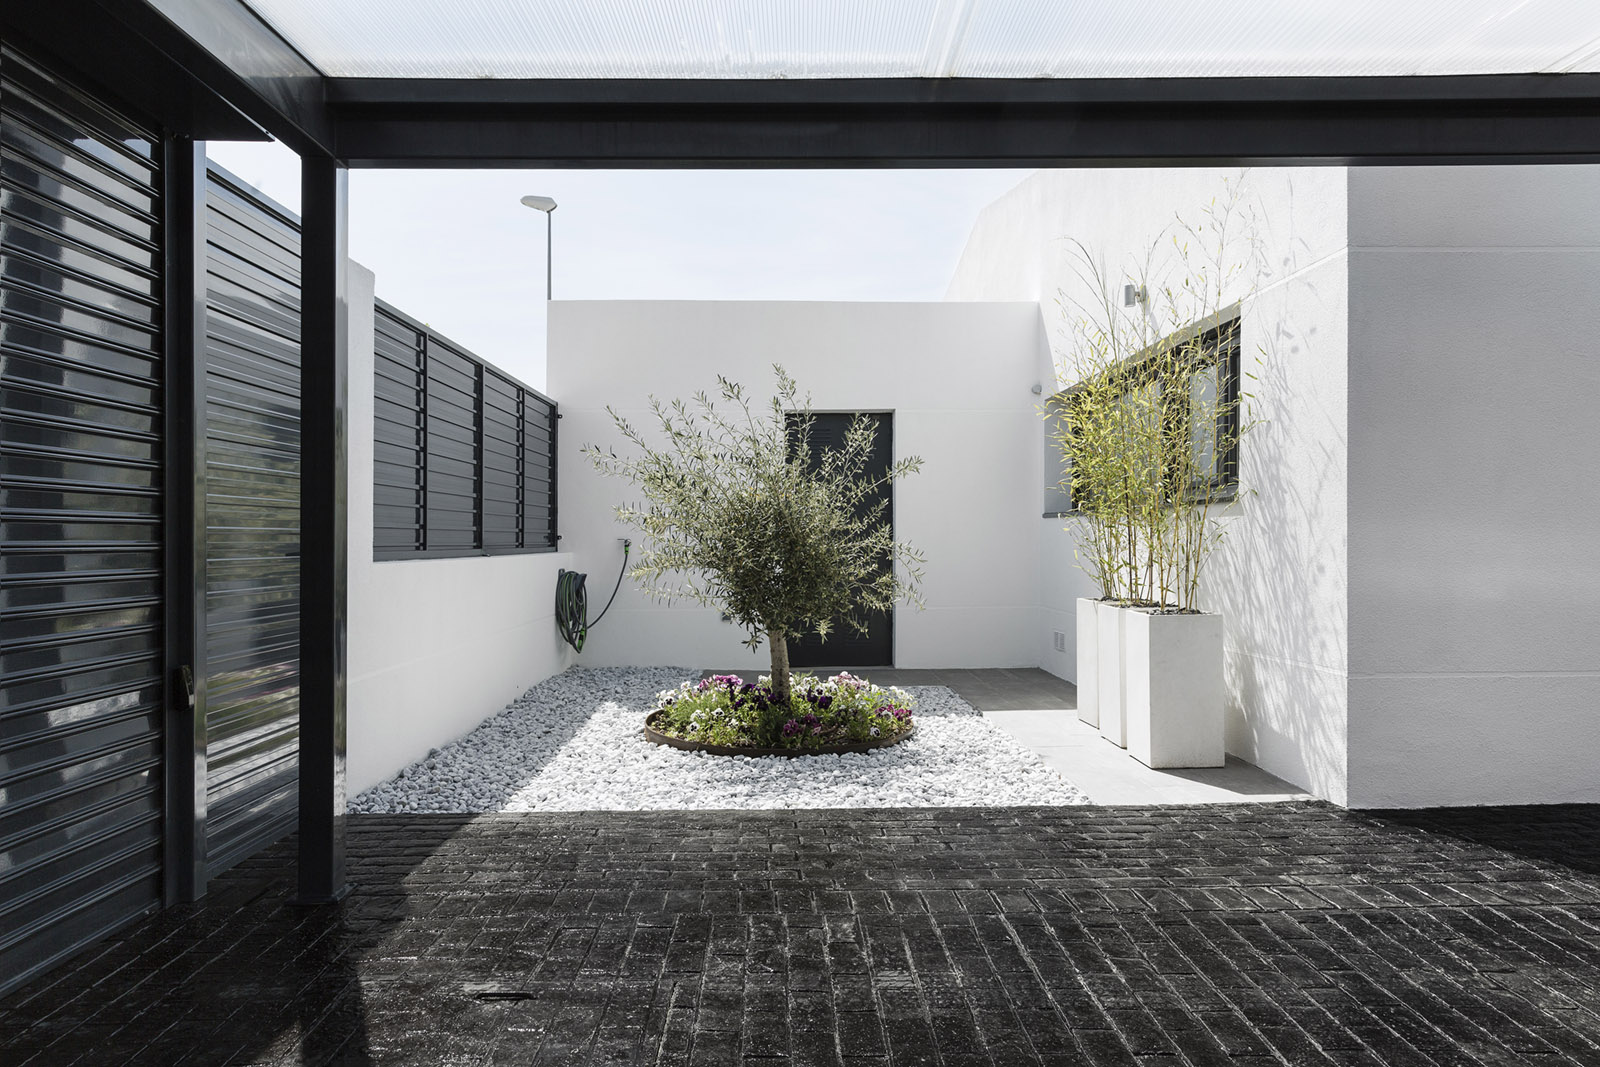 Architectural632-Interior-photographer-Madrid-Spain-.jpg